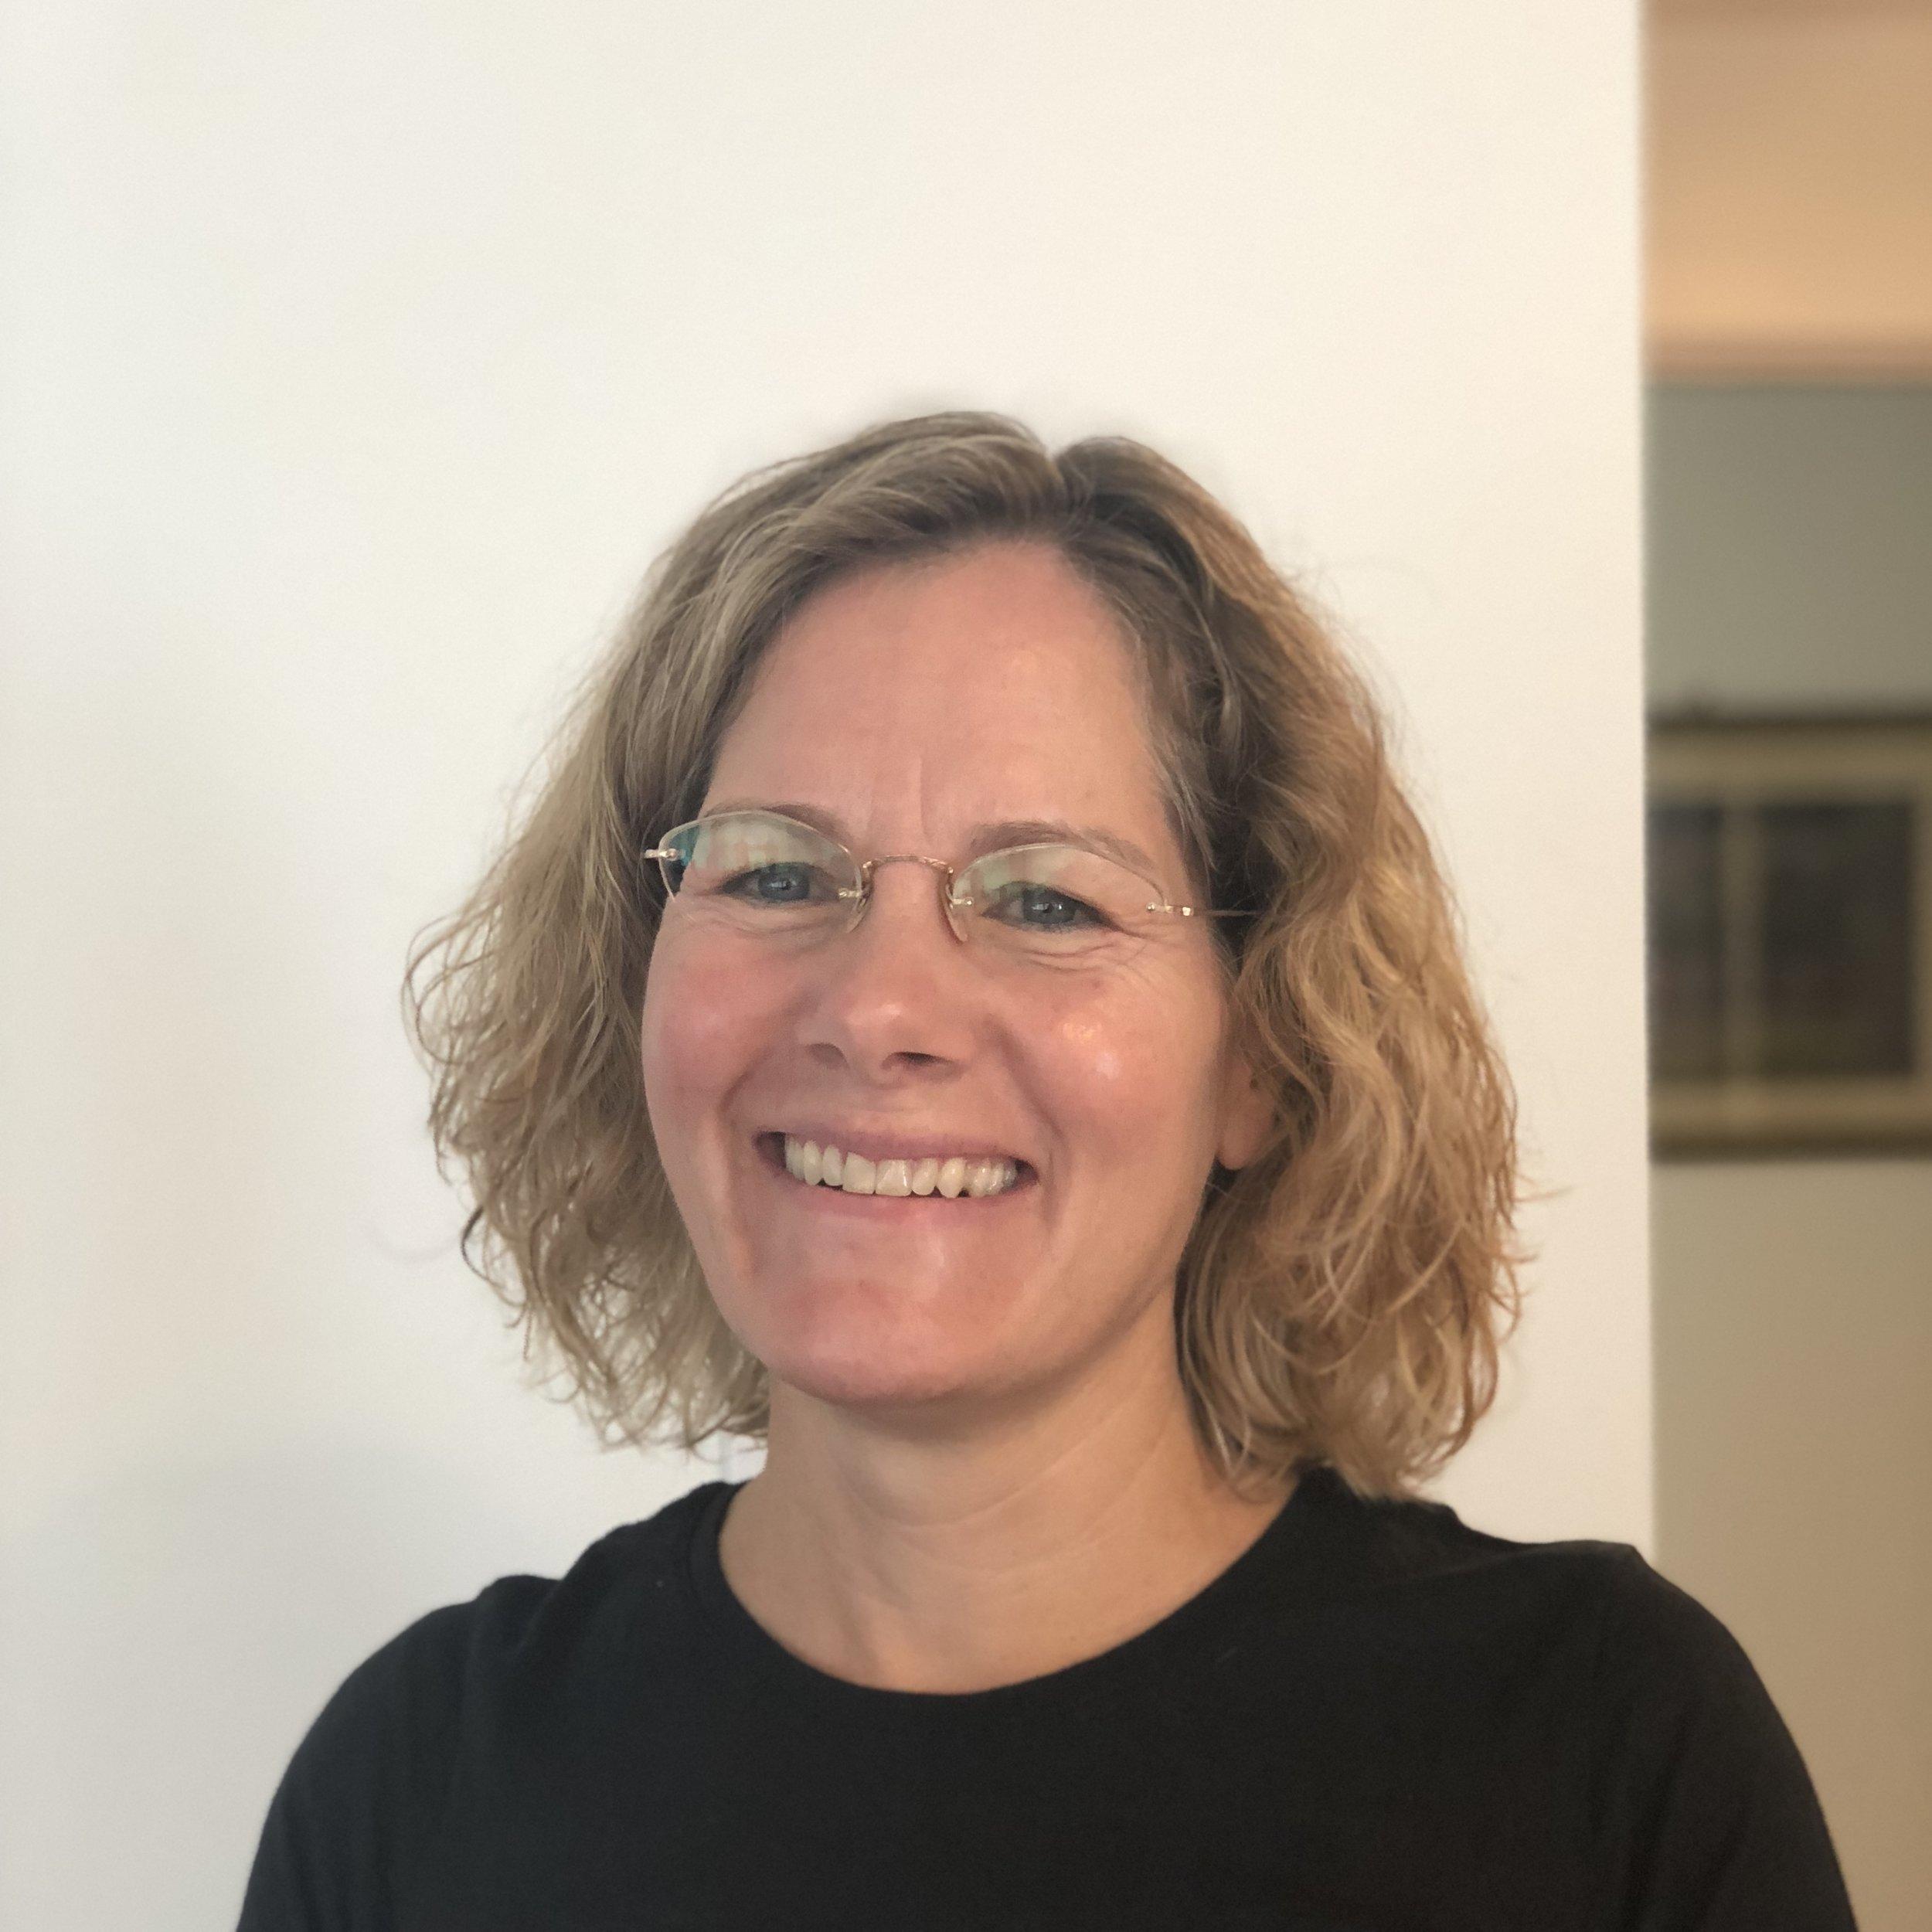 Patti SassoliDirector of Communications - communications@fpcphila.org